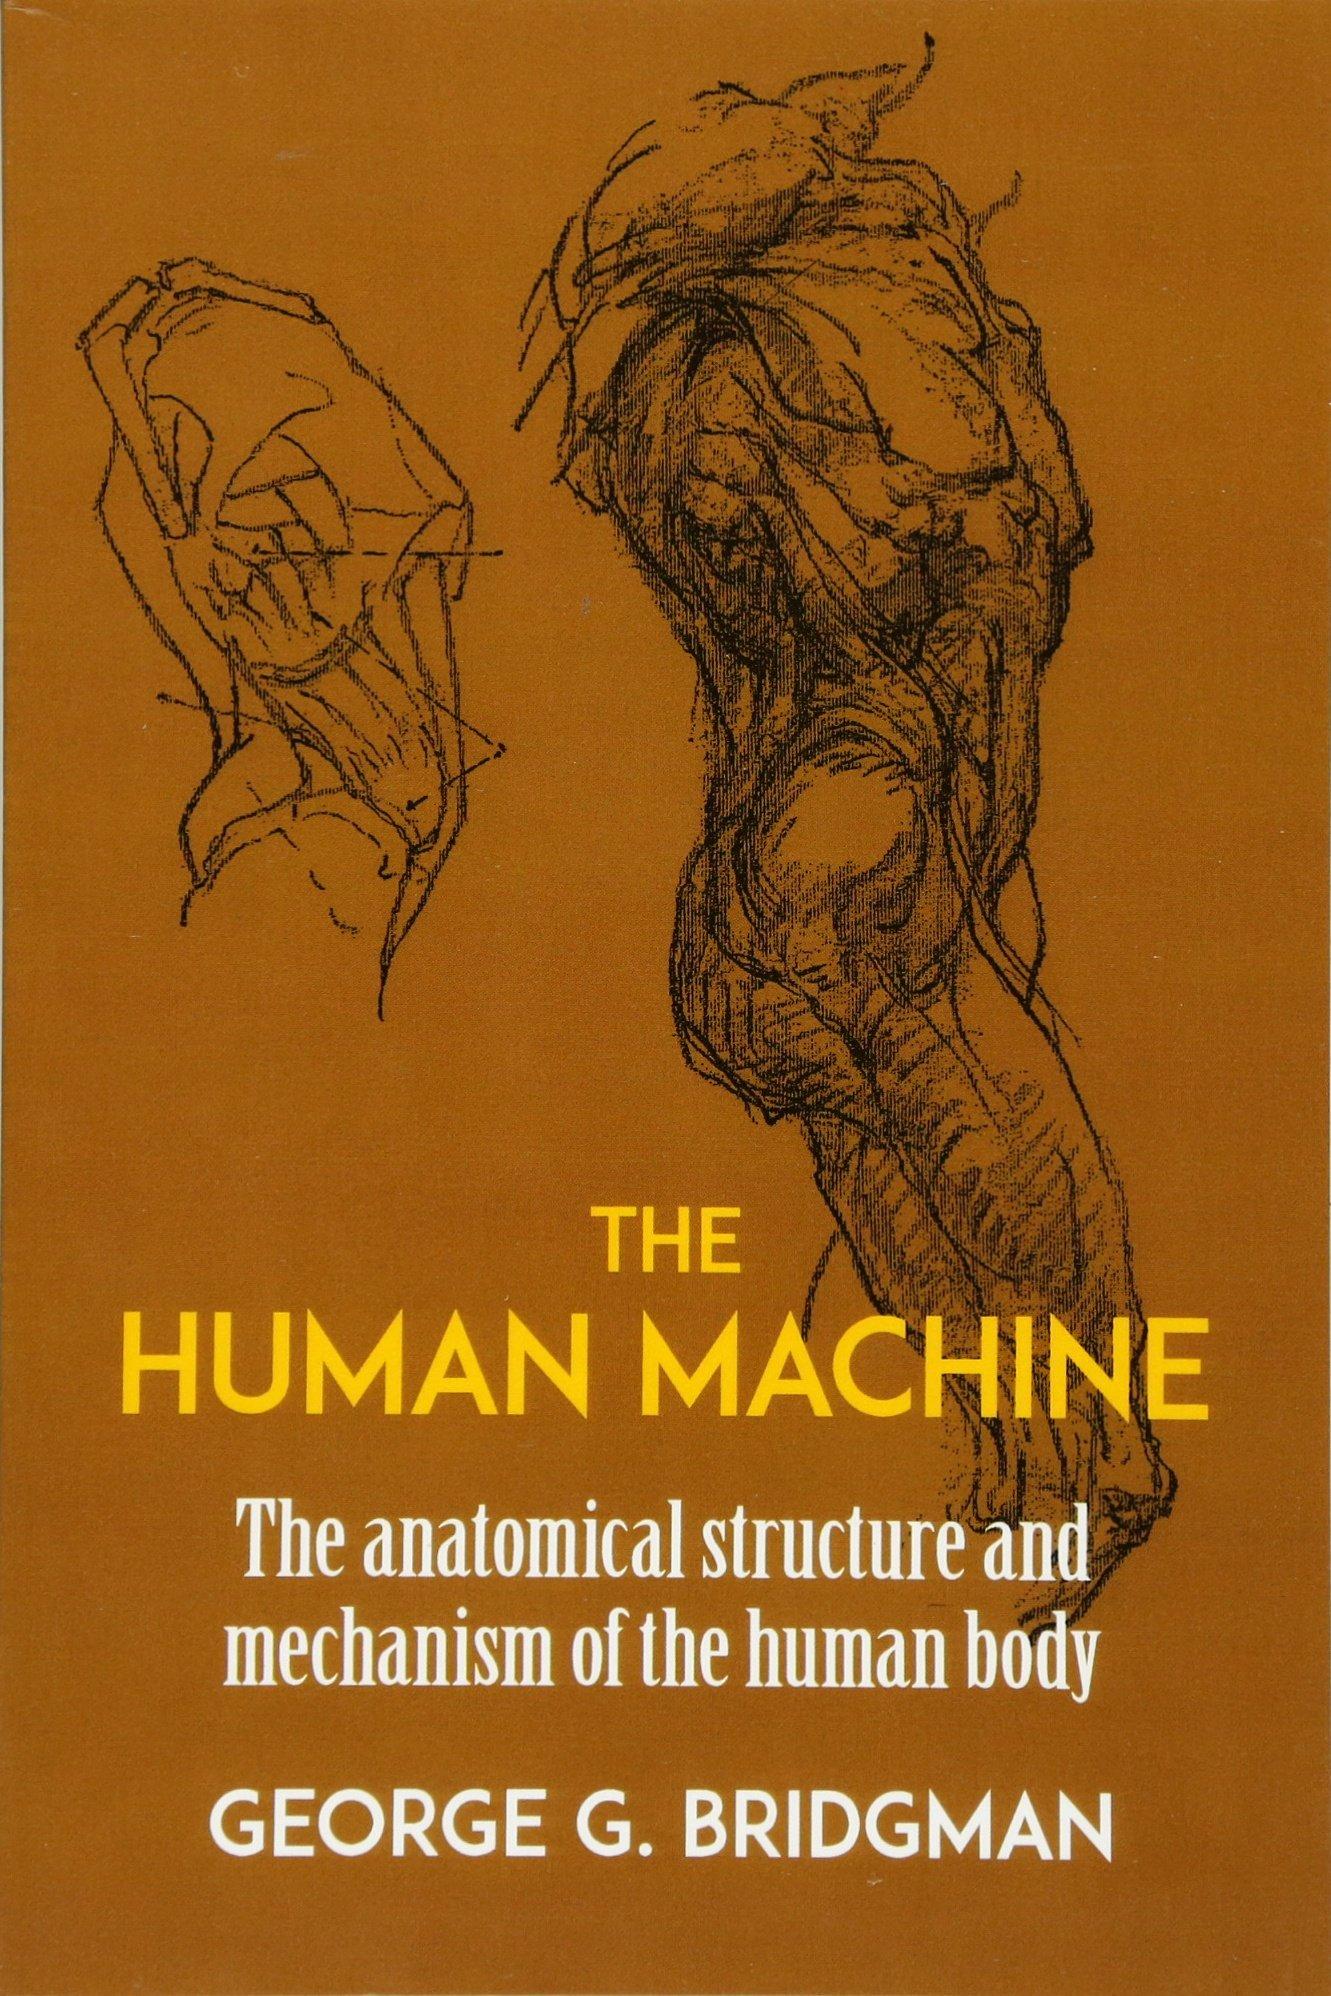 The Human Machine Dover Anatomy For Artists Amazon George